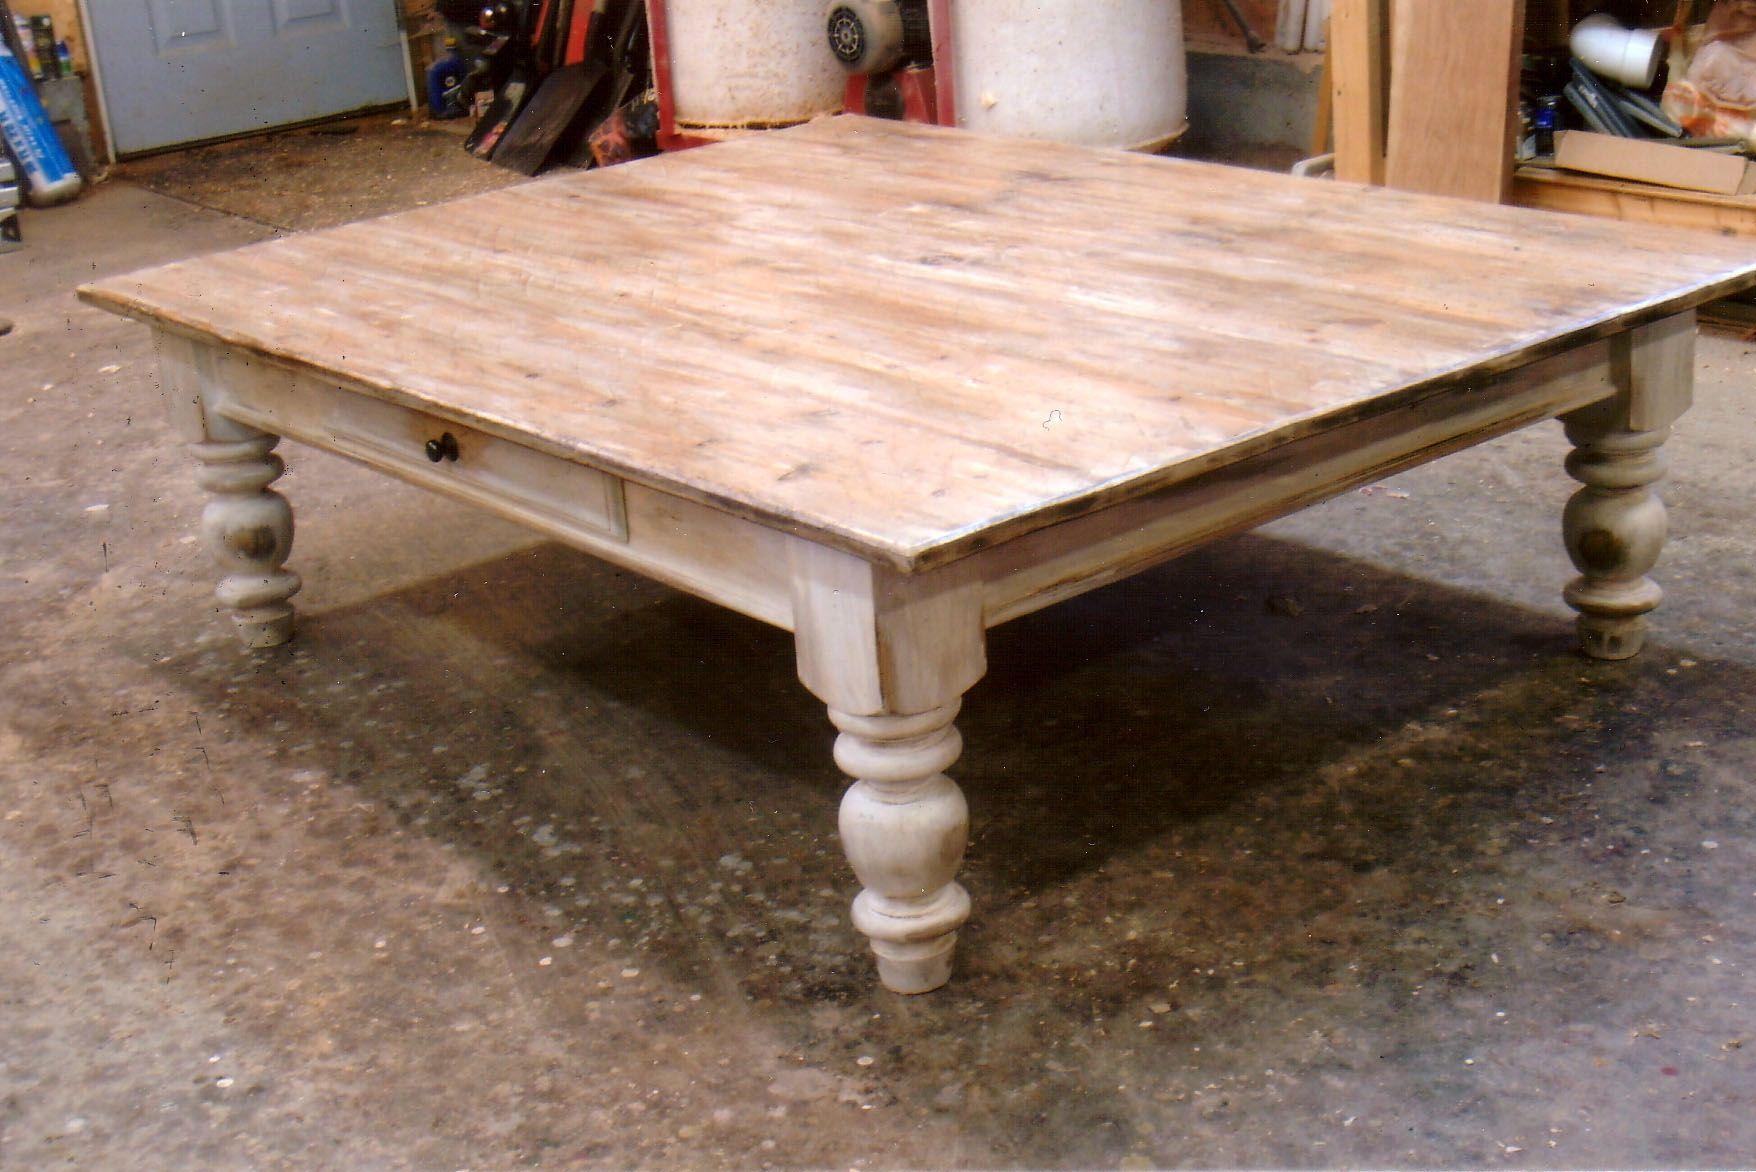 Custom Coffee Tables Handmade Wood Coffee Tables Large Square Coffee Table Pine Coffee Table Square Wooden Coffee Table [ 1172 x 1756 Pixel ]